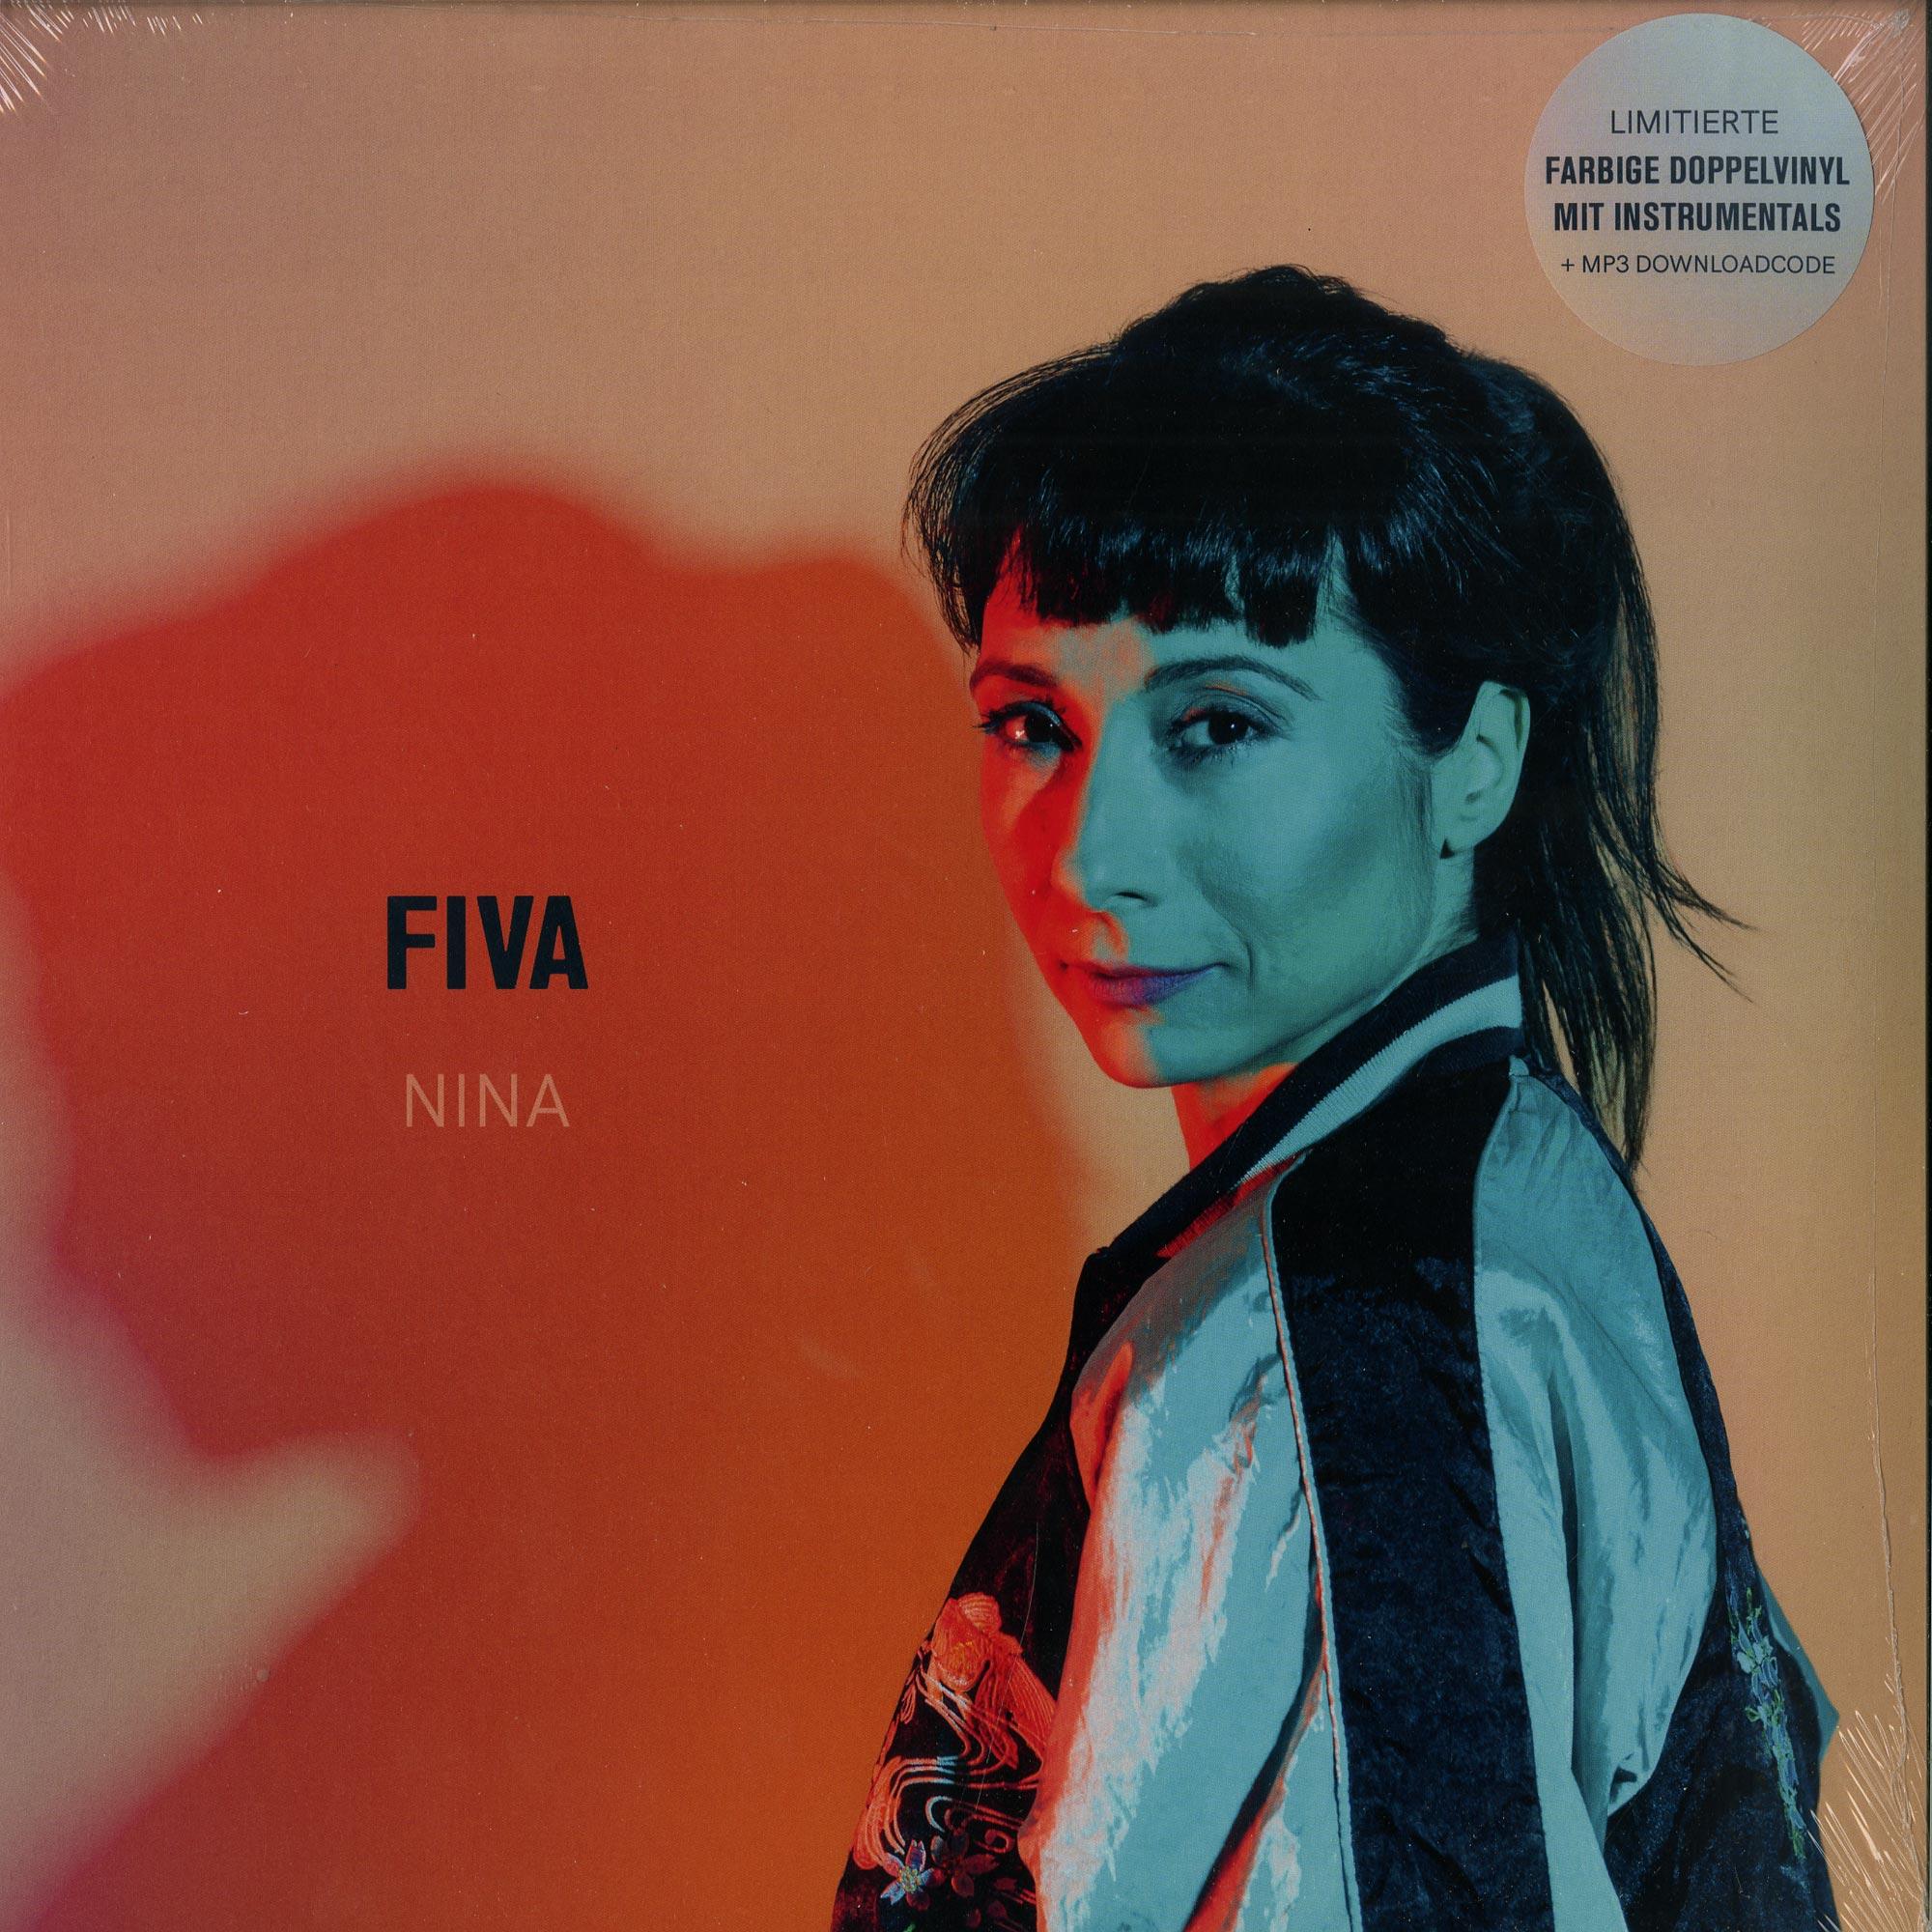 Fiva - NINA